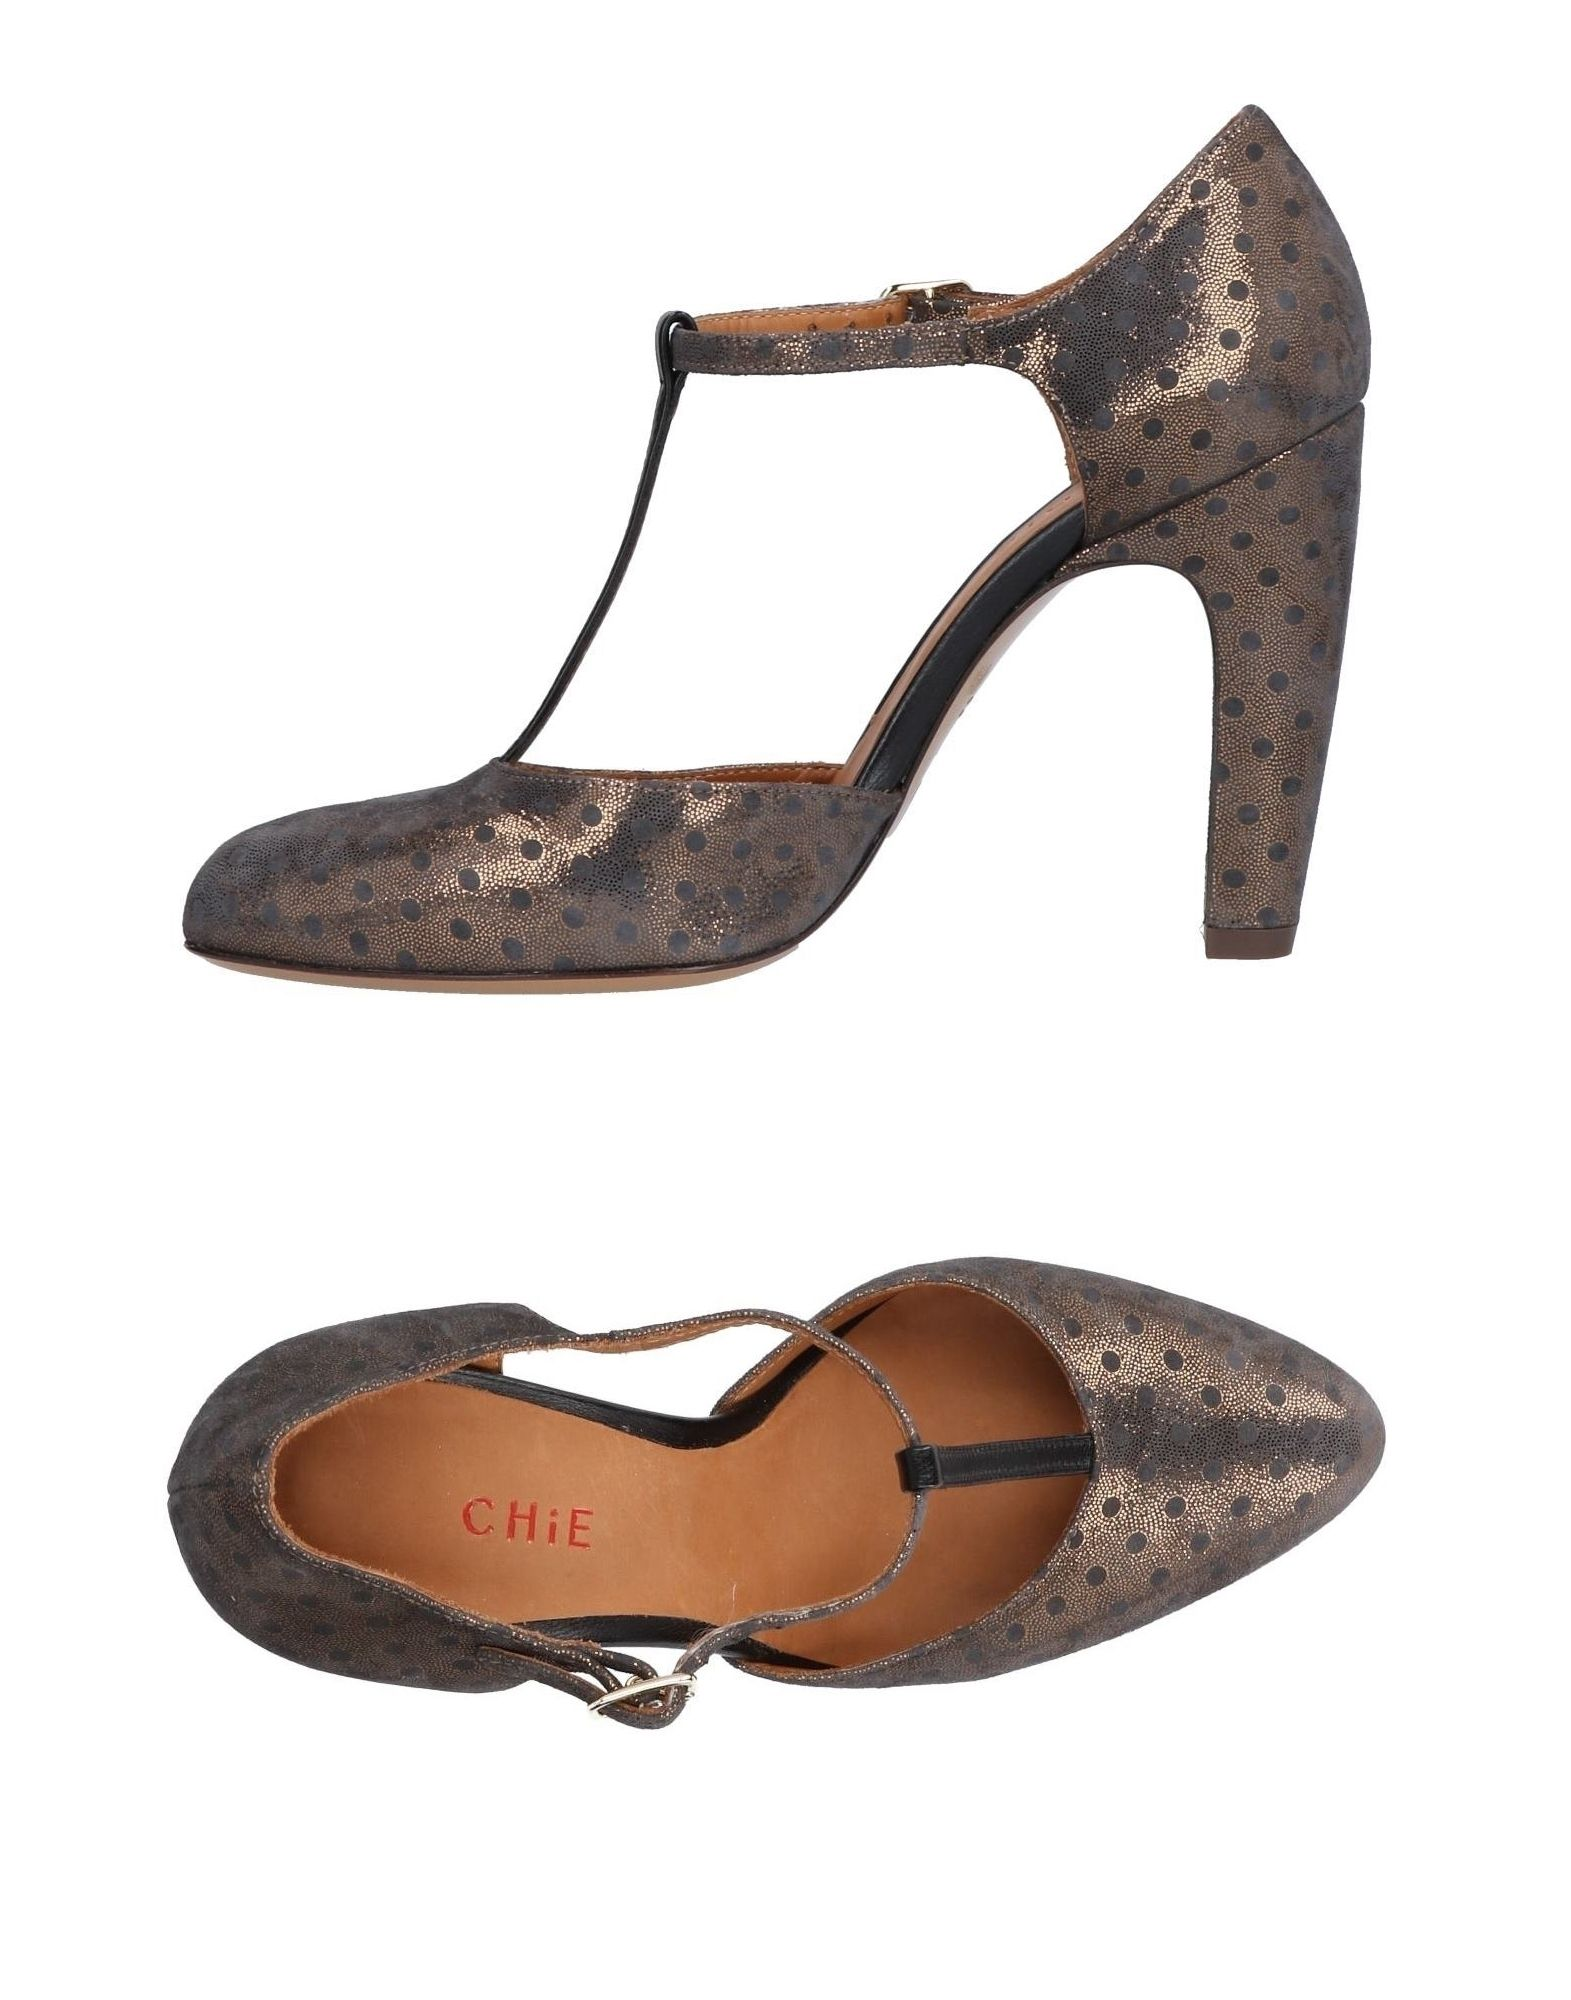 Rabatt Schuhe Chie By Chie Mihara Pumps Damen  11460618TP